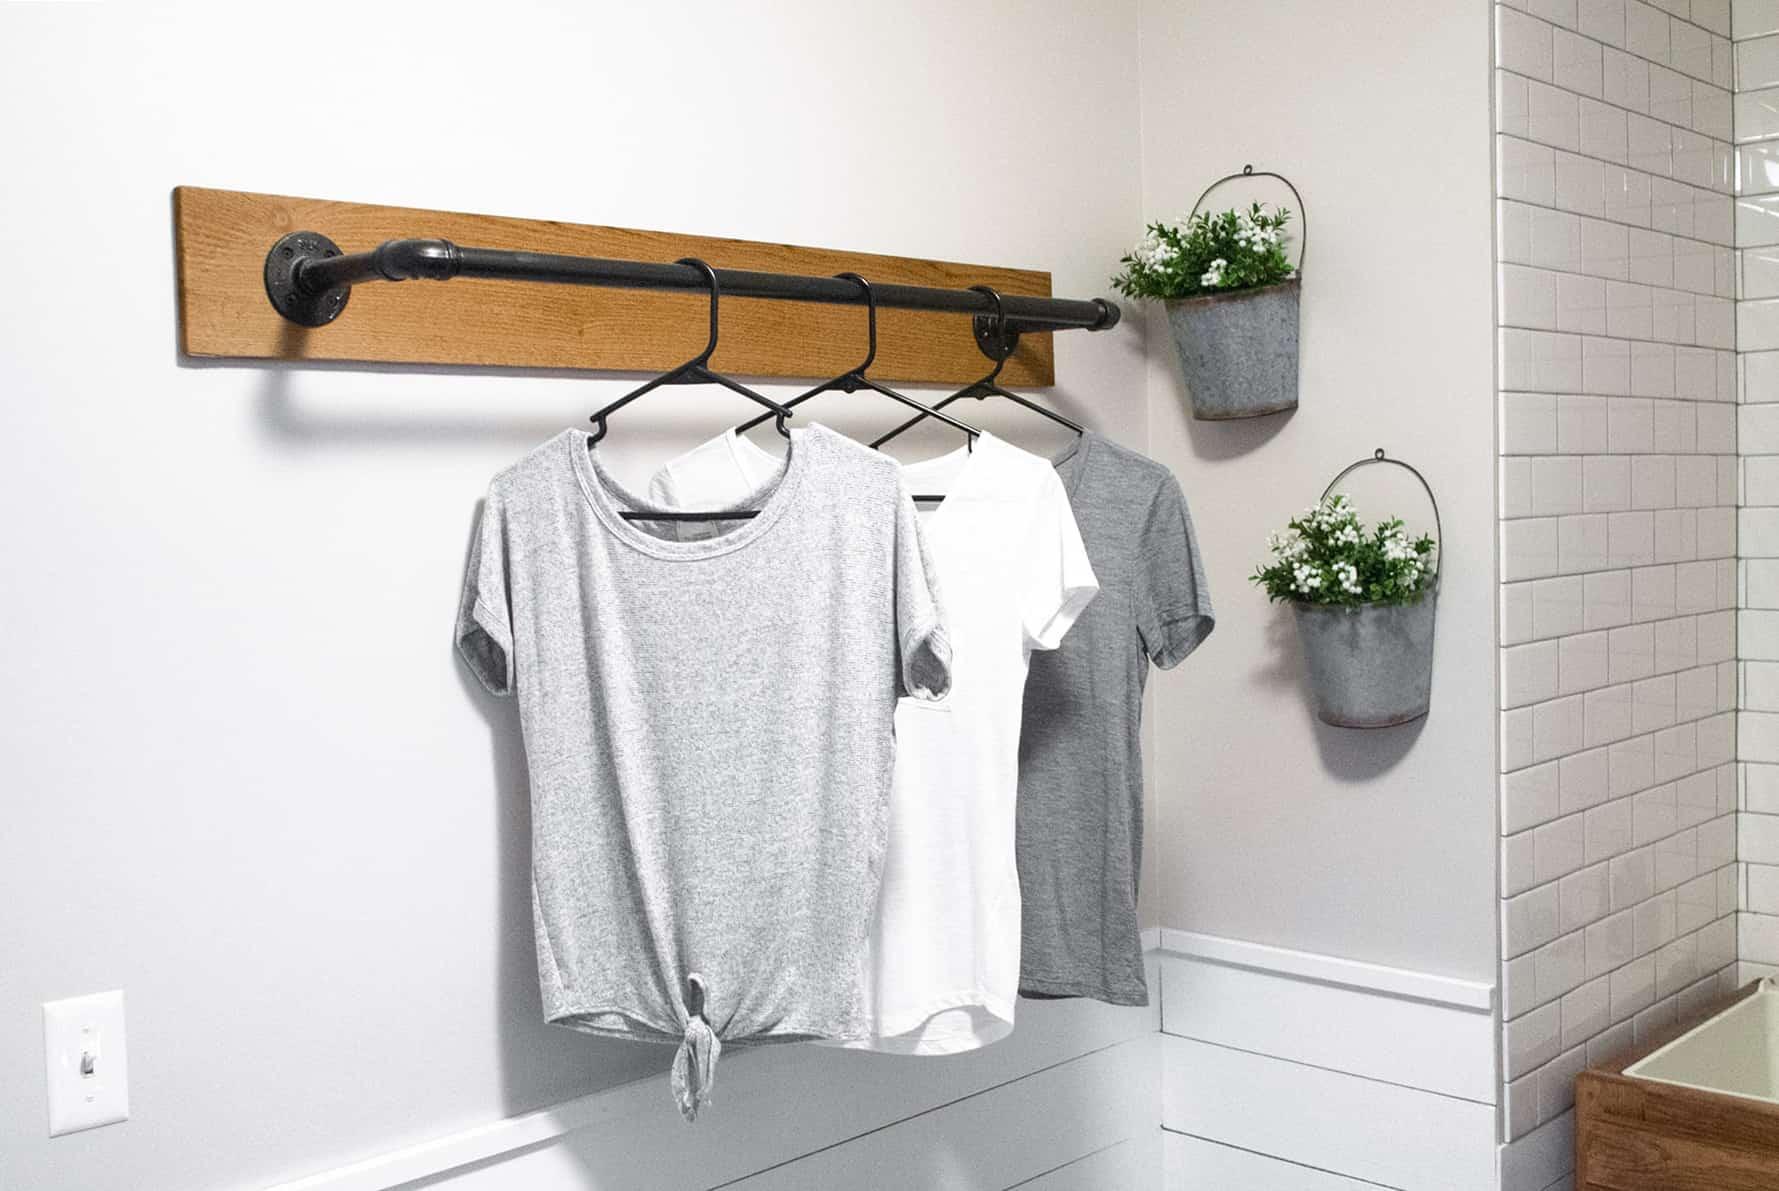 Diy wall mounted clothing rack